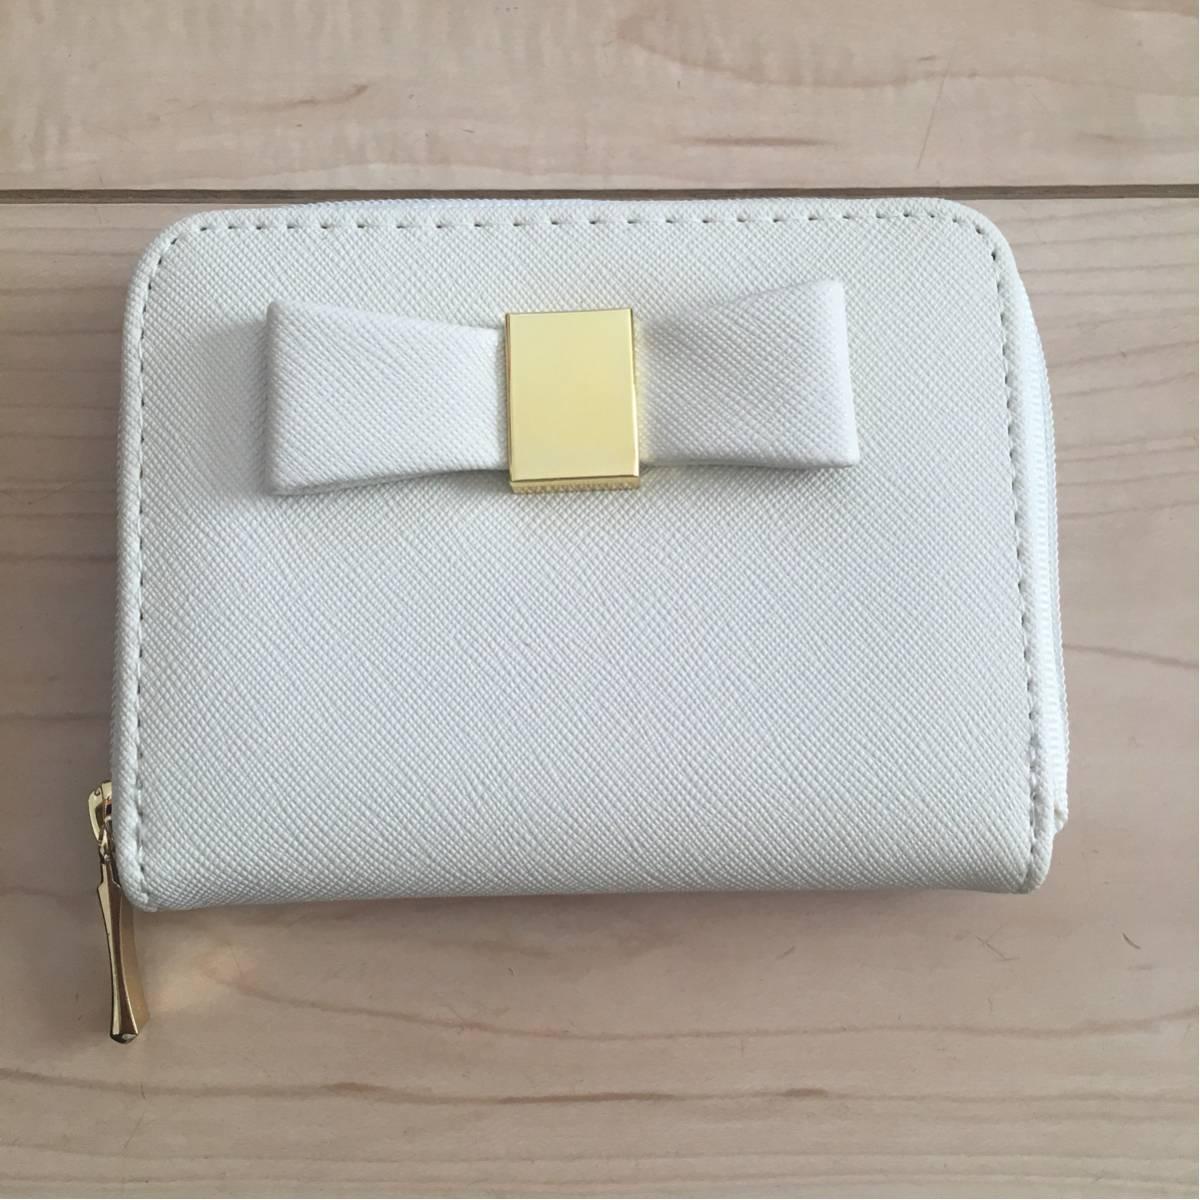 new product 289c9 358c6 代購代標第一品牌- 樂淘letao - リボン付き財布カードケース ...